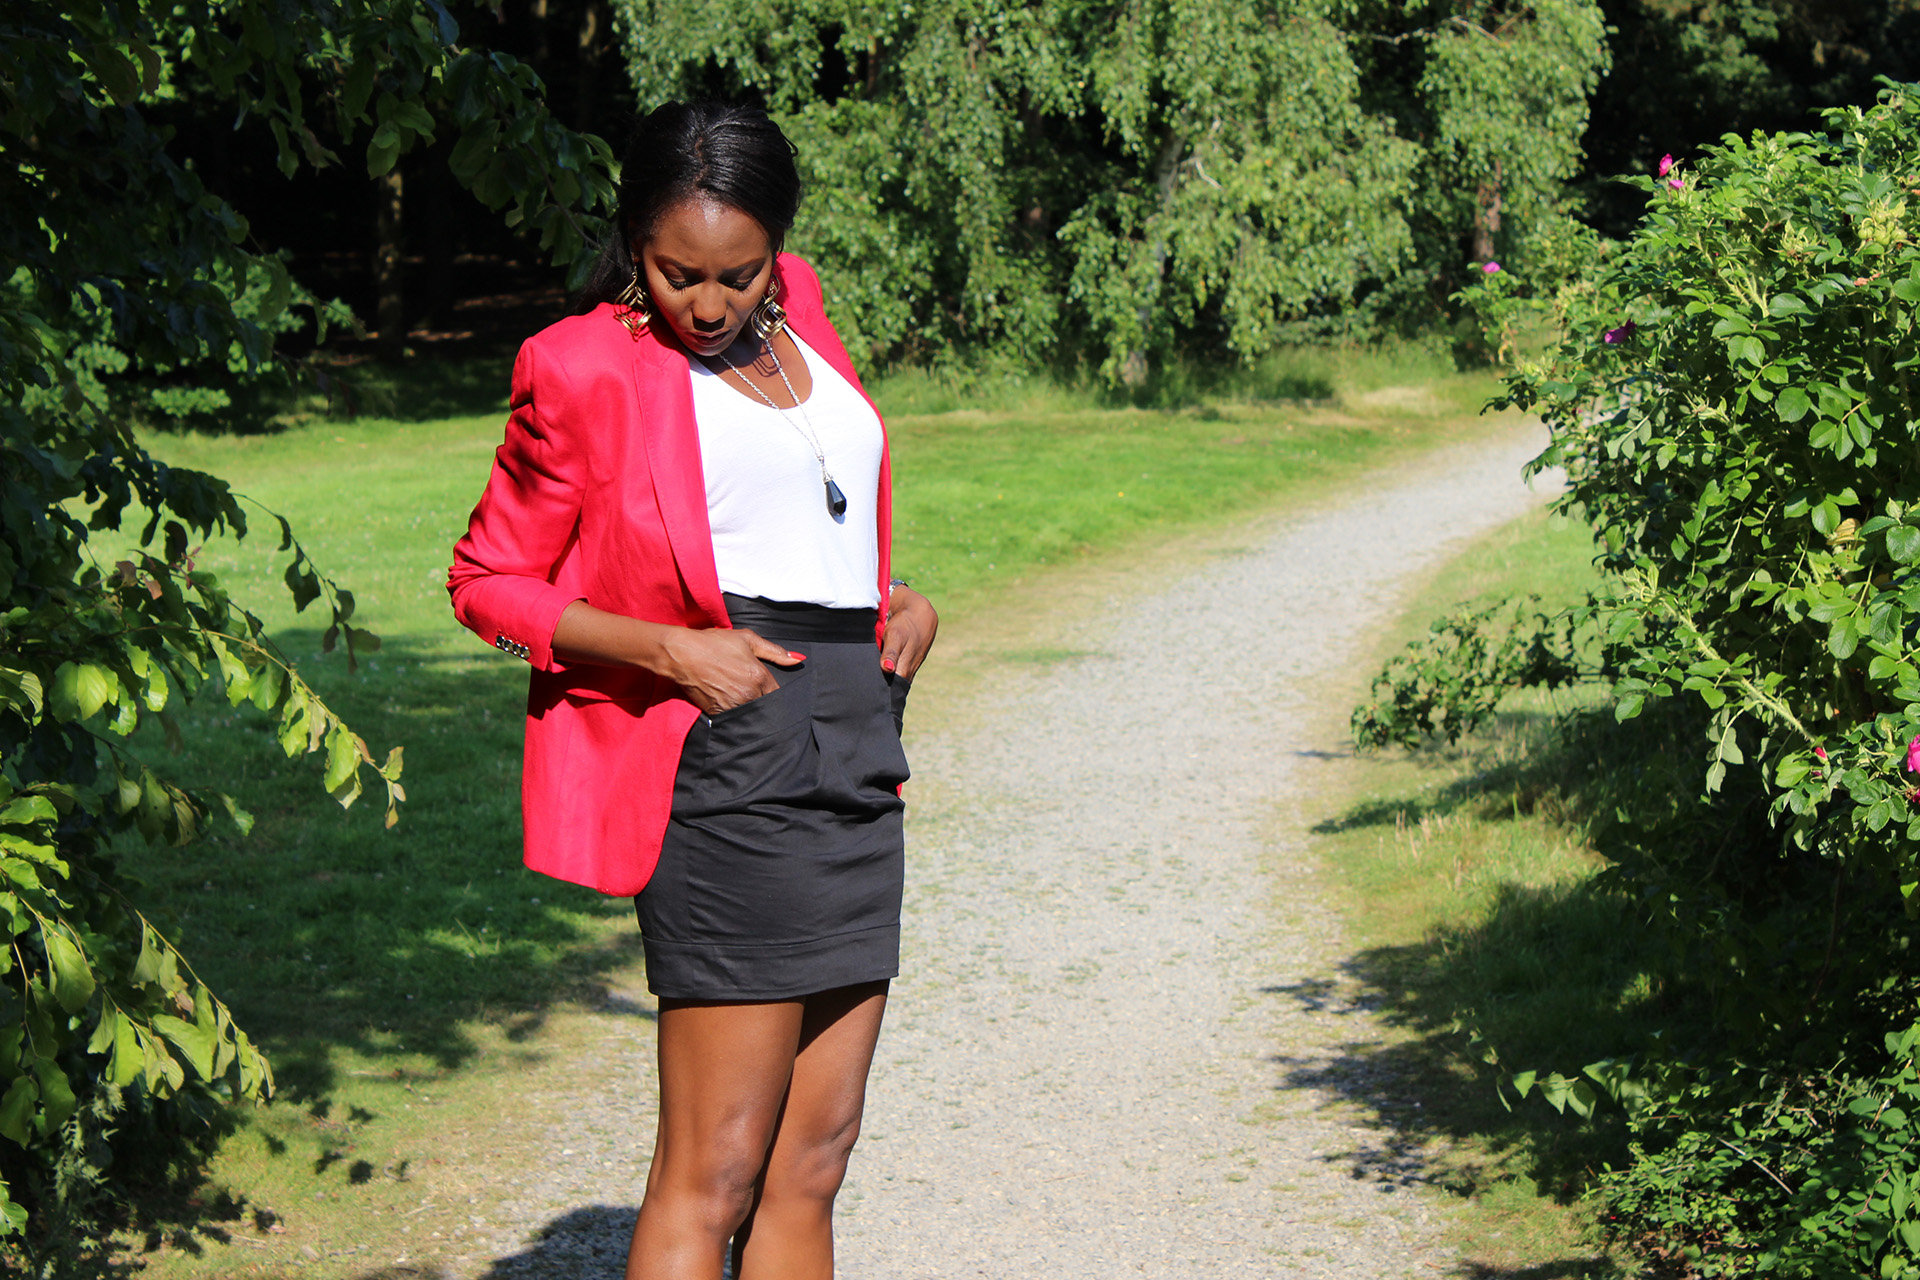 fashion-ootd-outifts-summerstyle-nunaavane-bblogger-ctbb